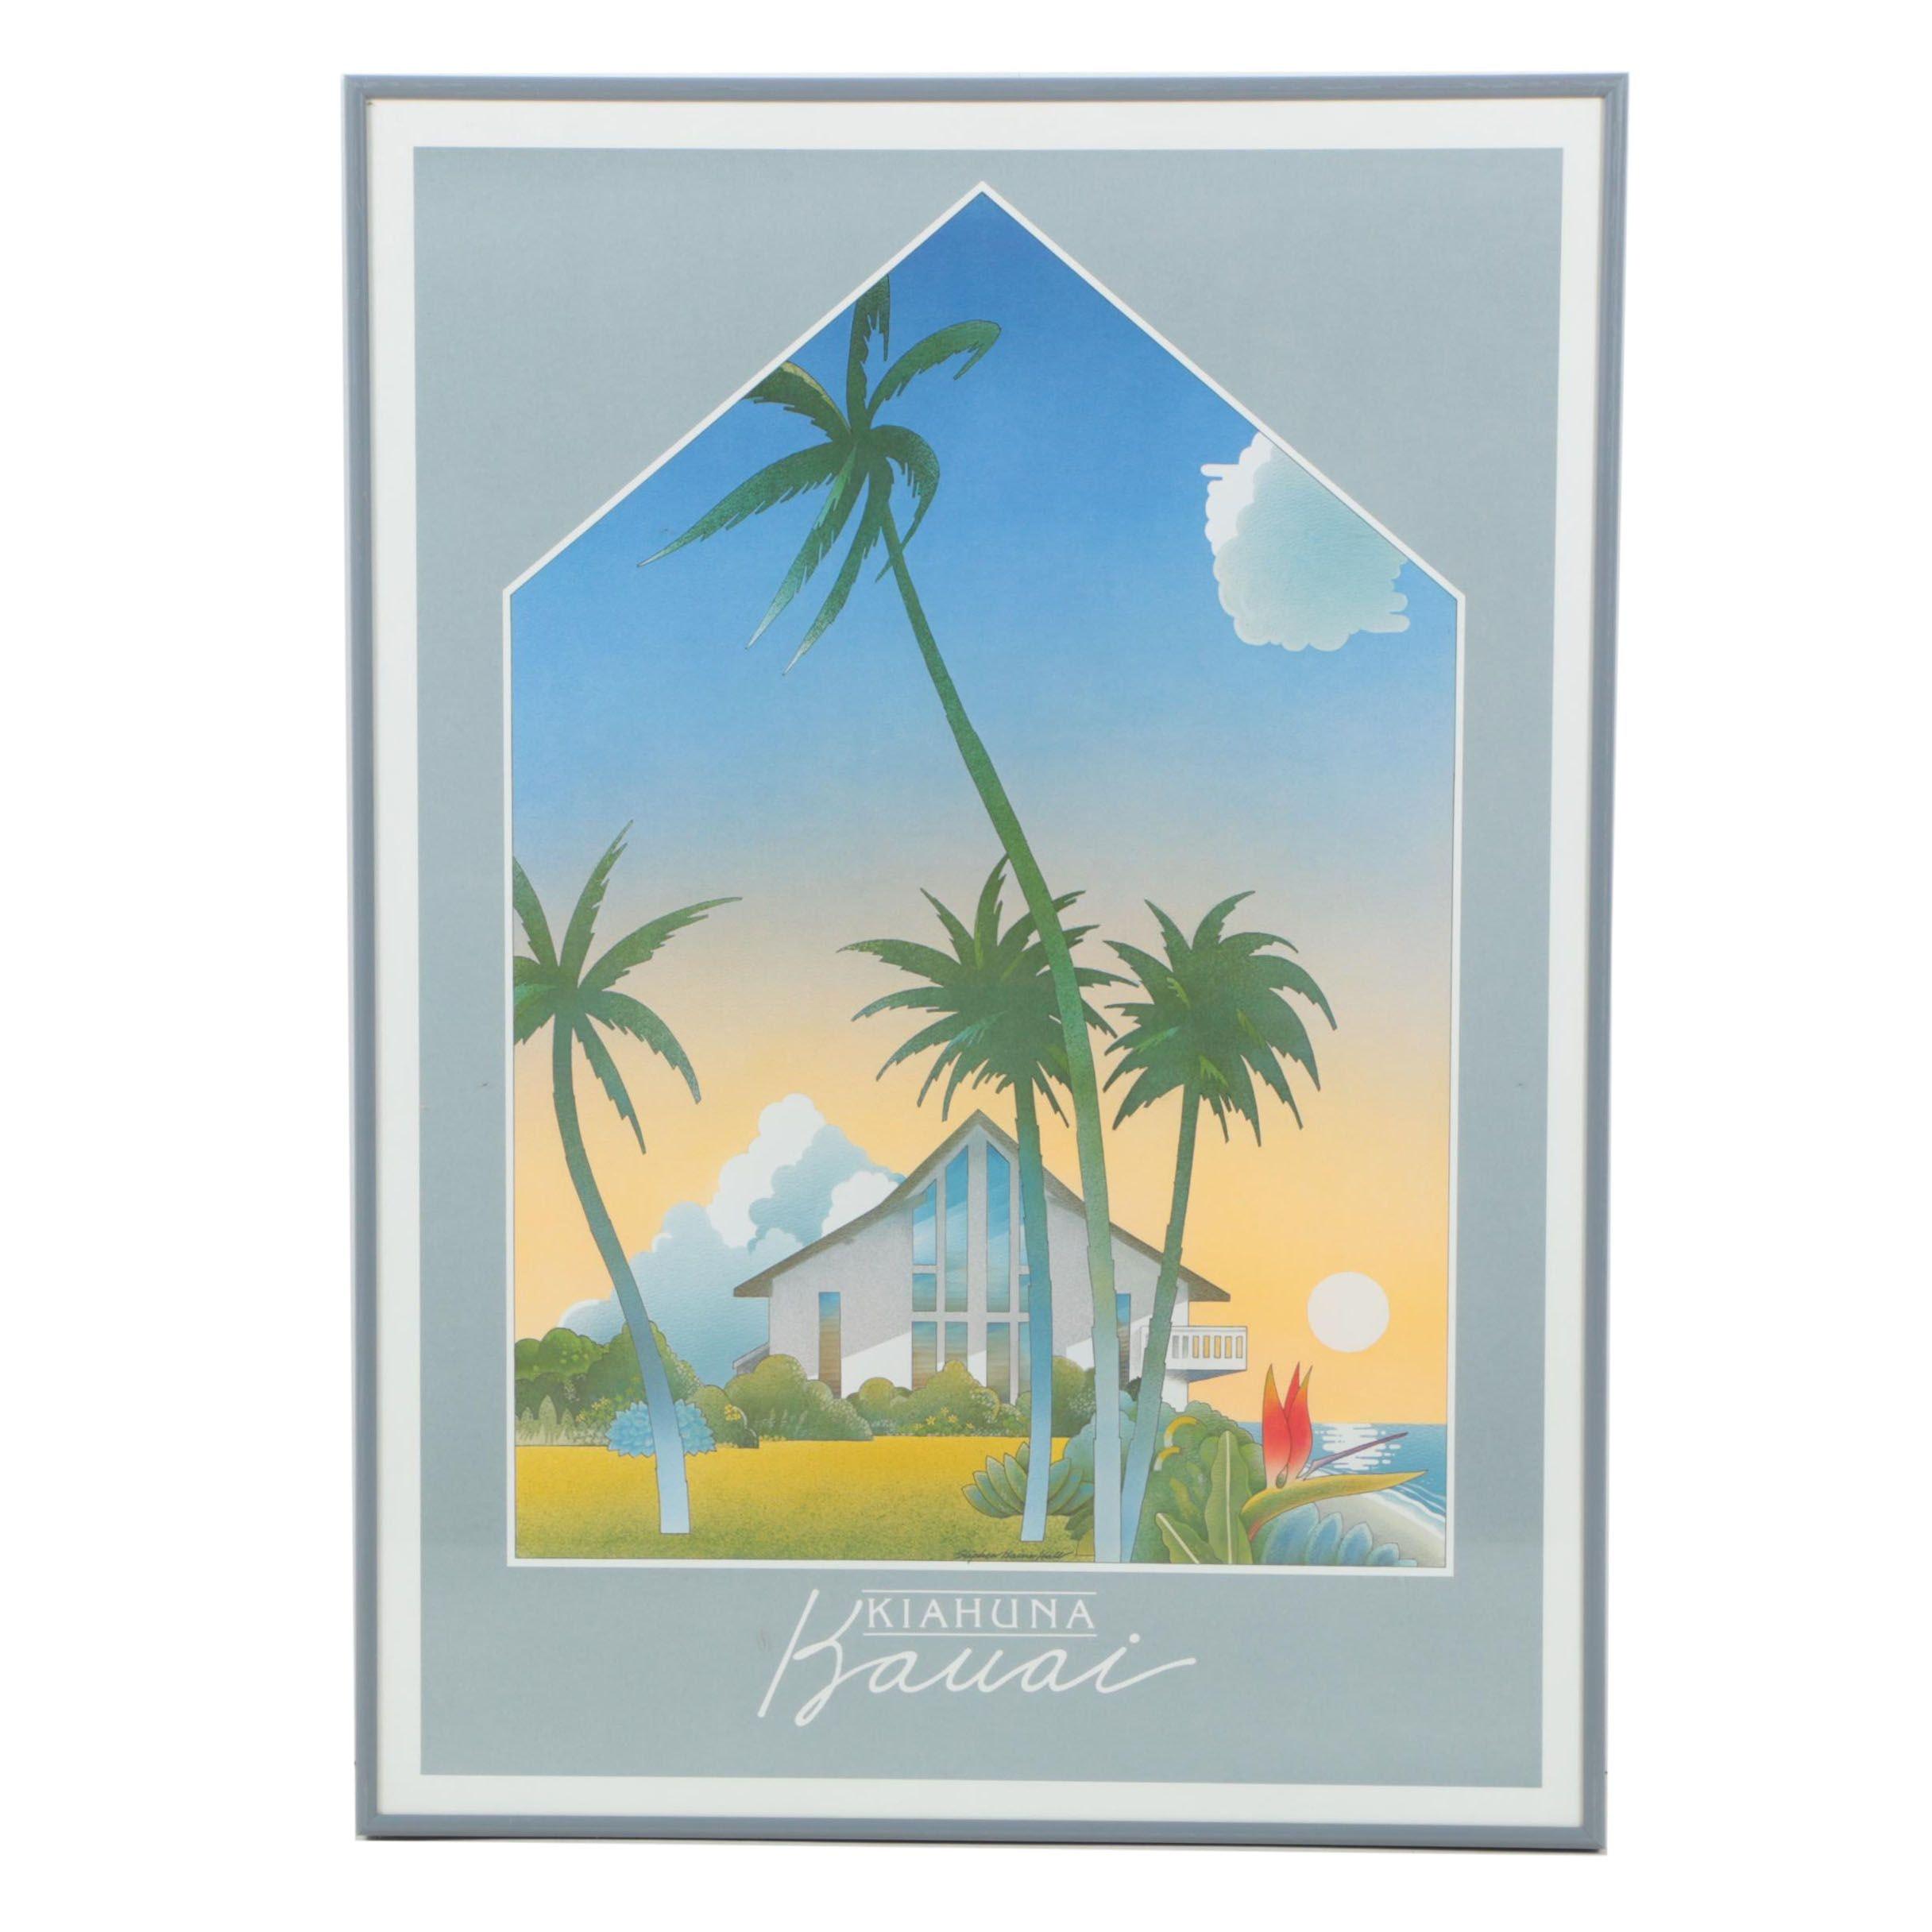 Kiahuna Kauai Poster After Painting by Stephen Haines Hall